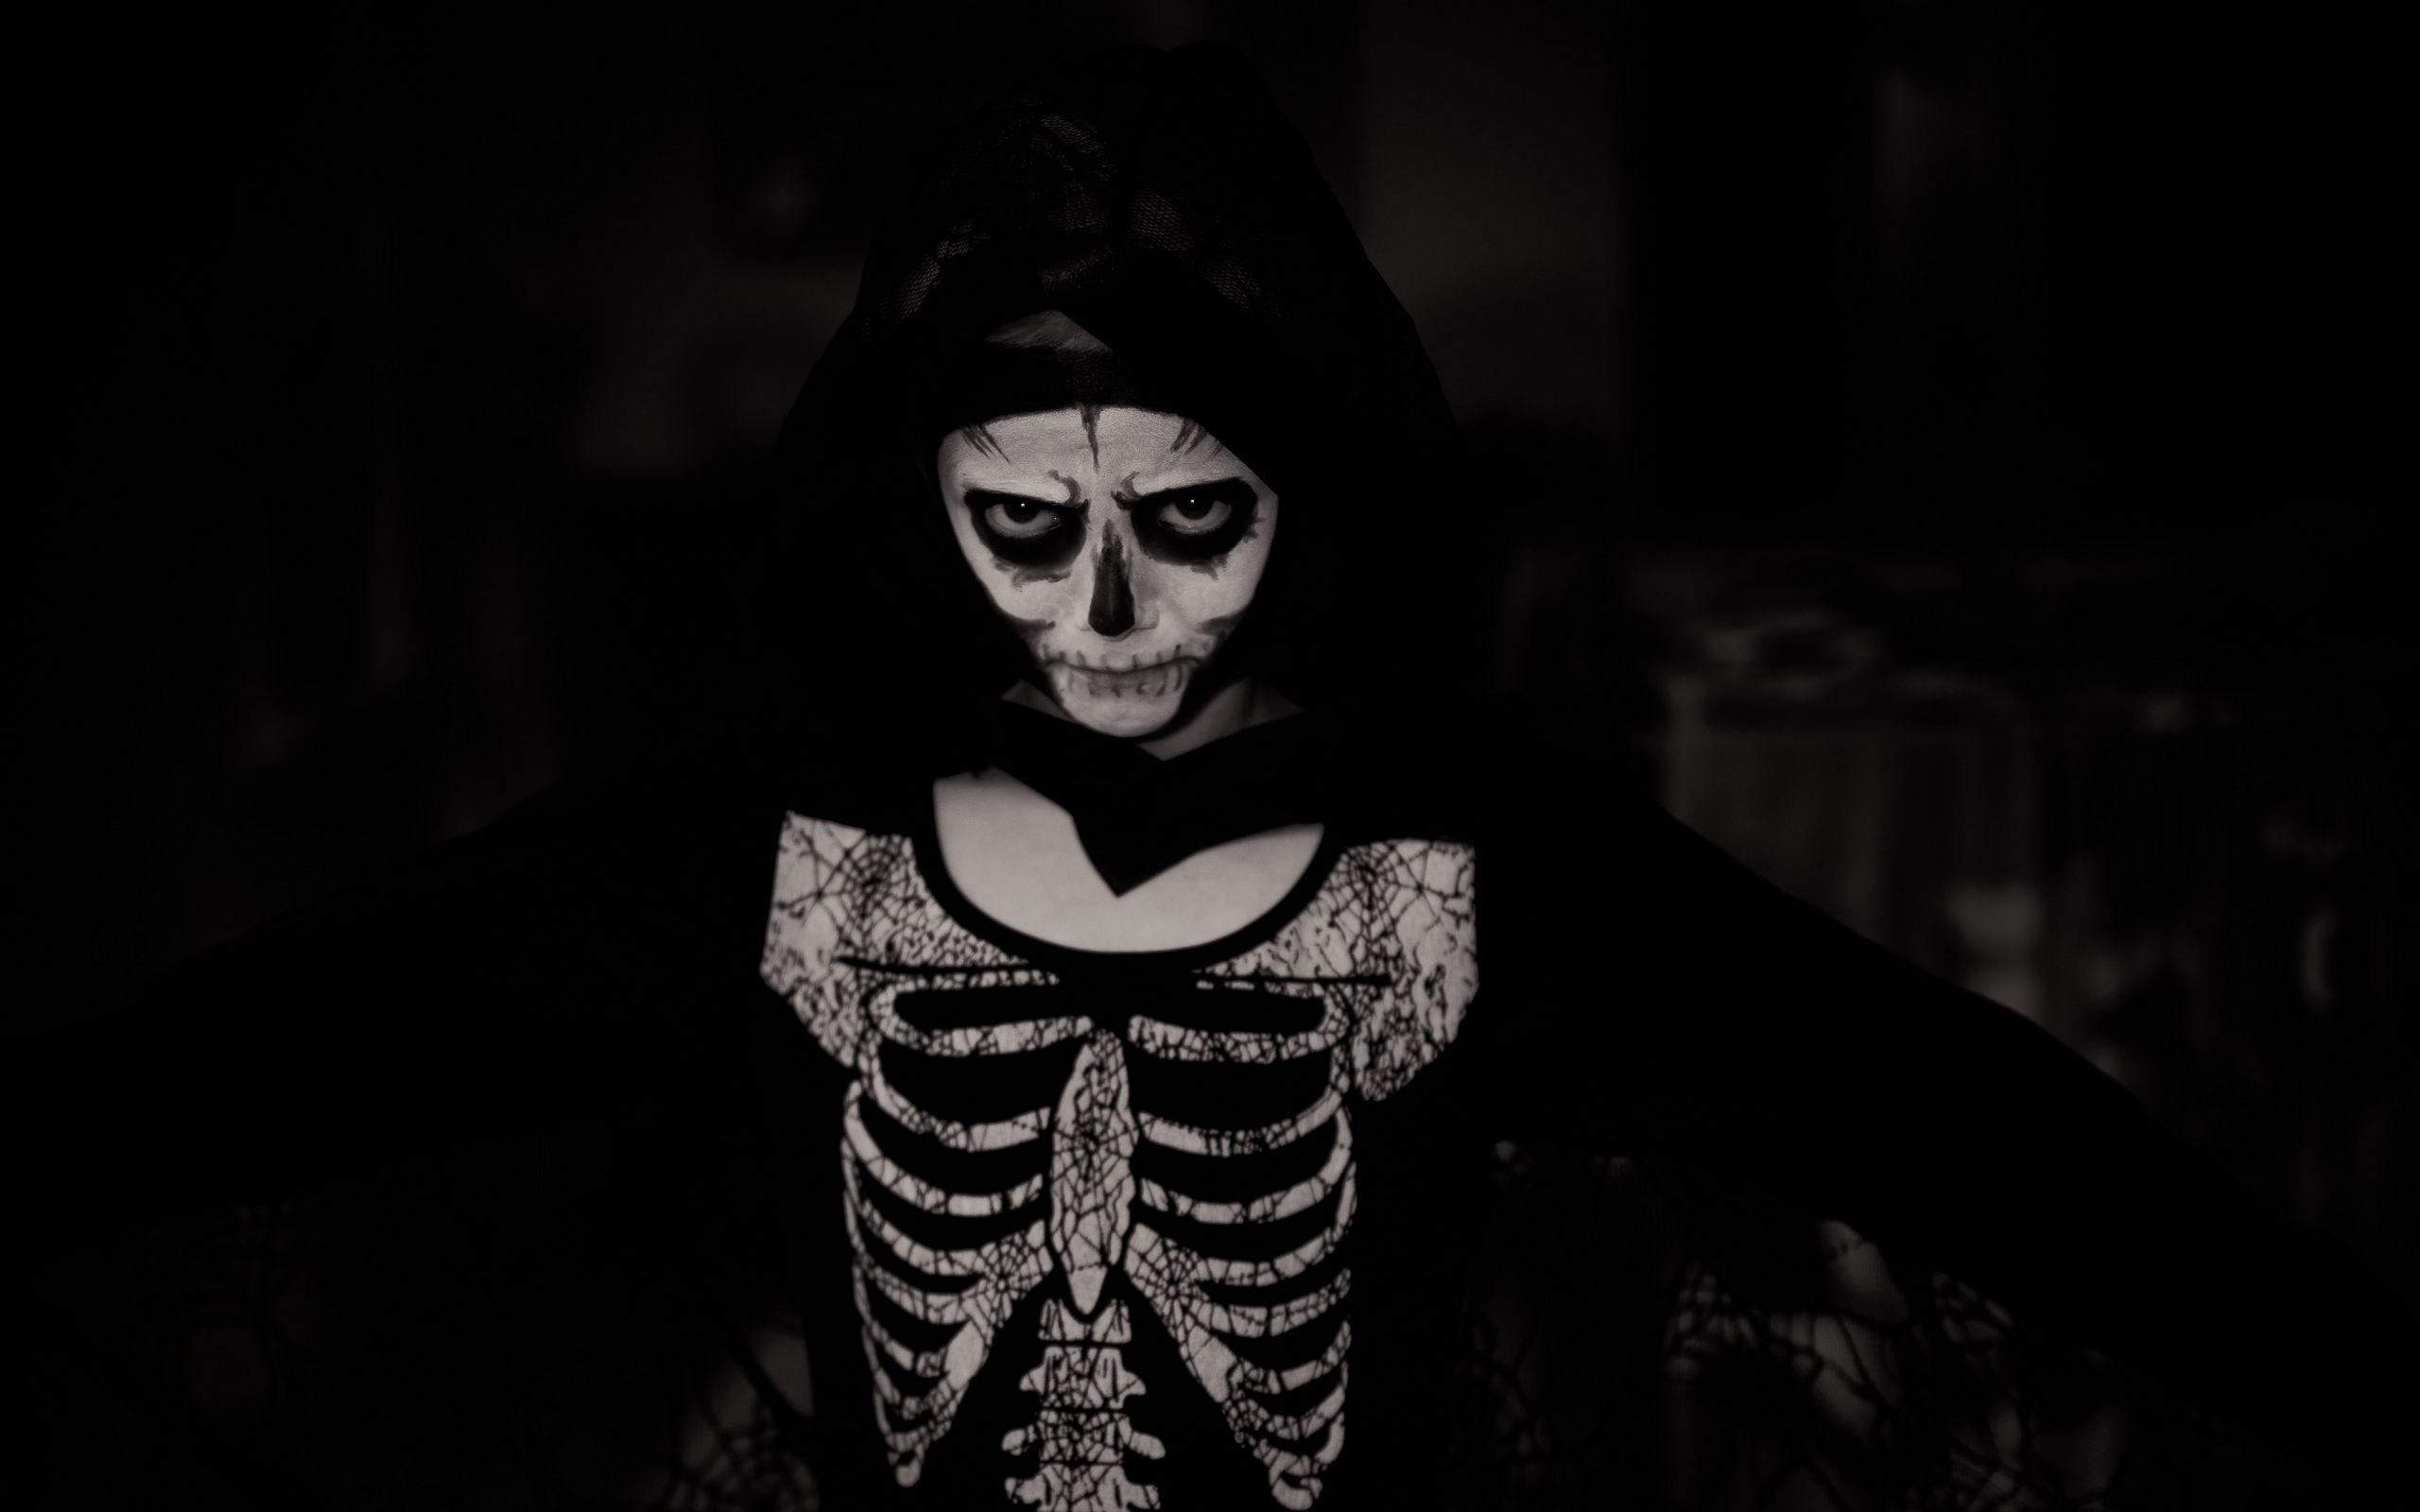 2560x1600 Wallpaper halloween, costume, skeleton, bw